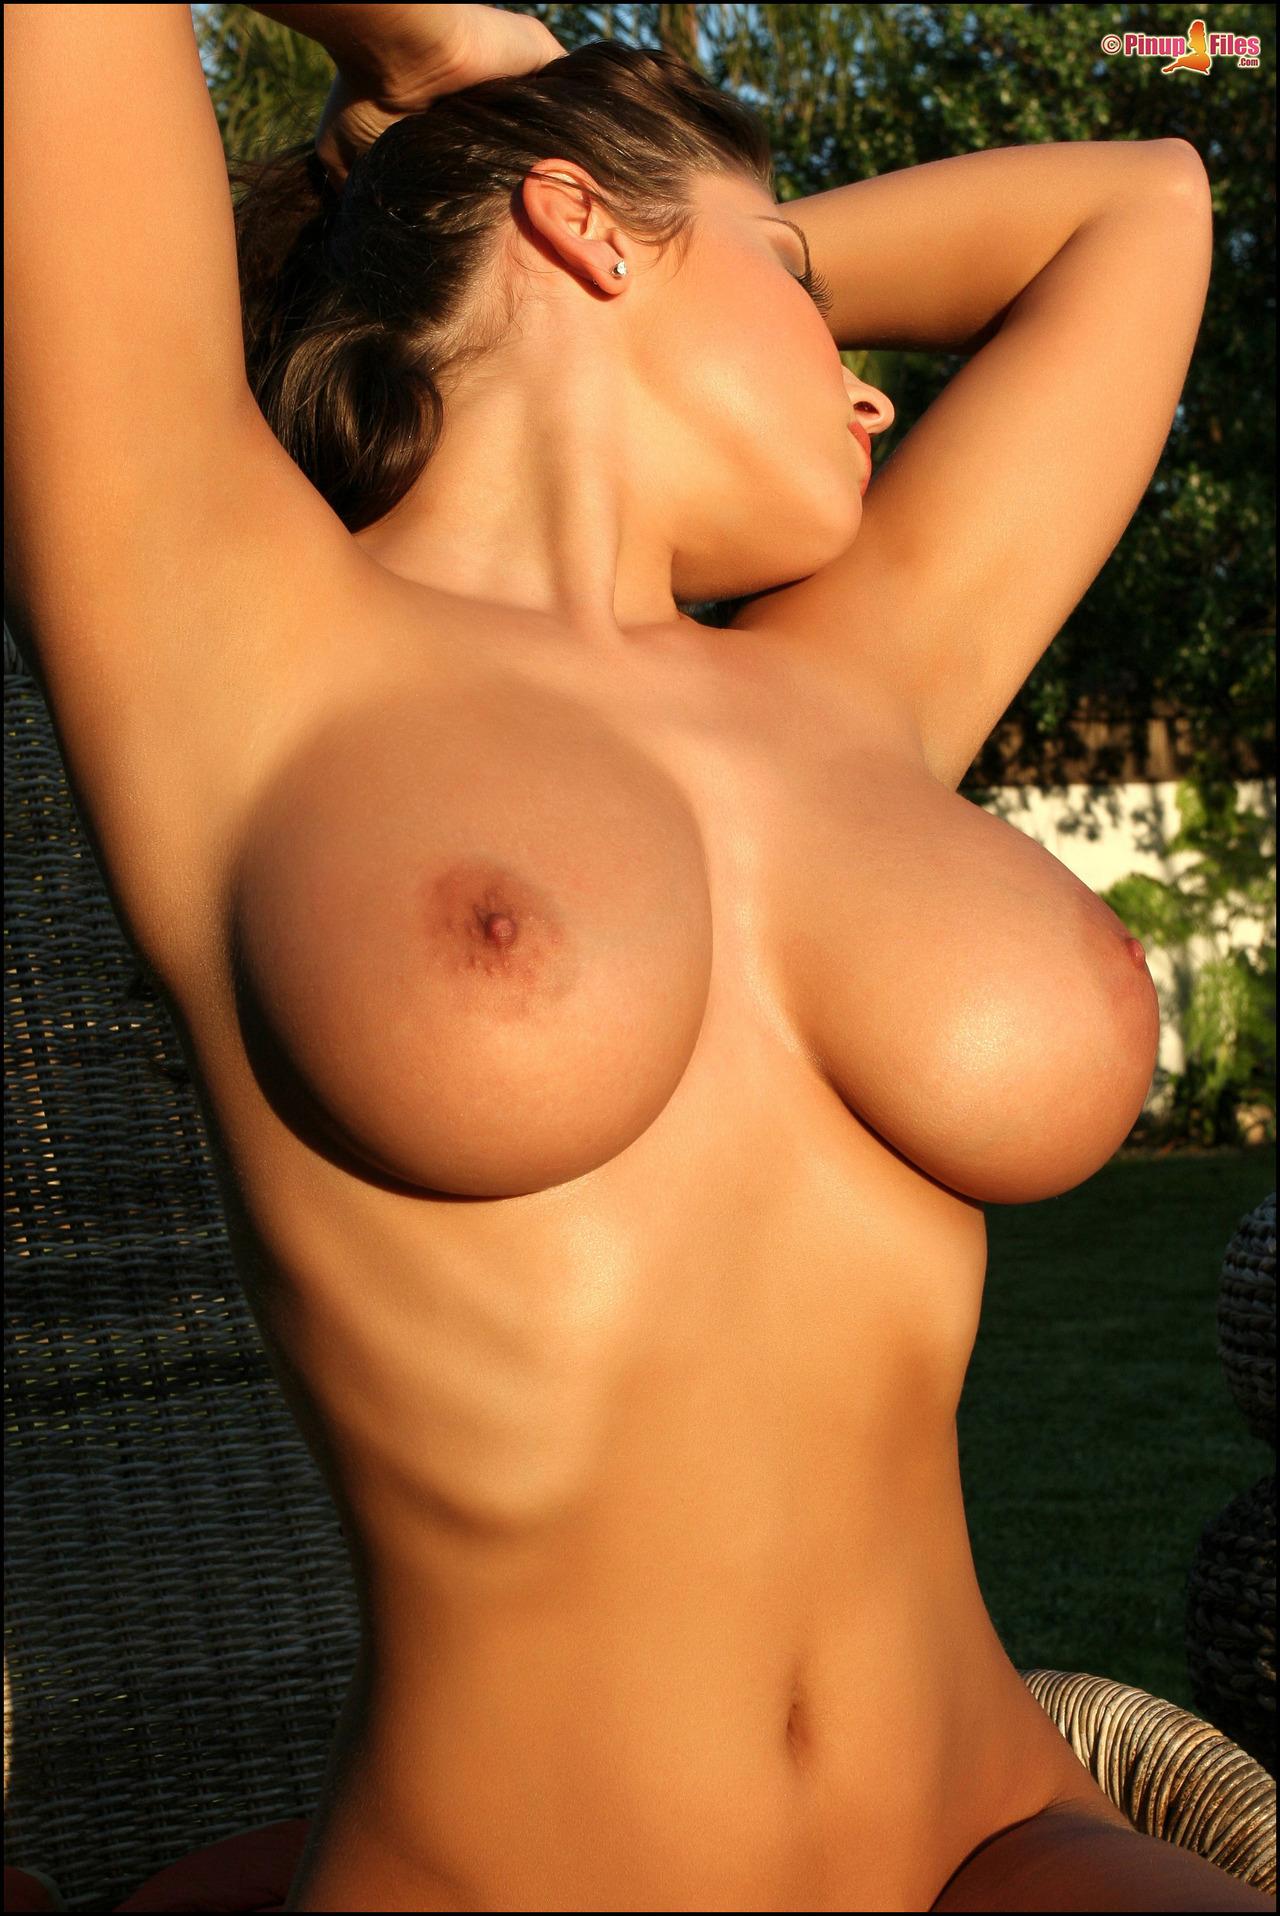 golie-siski-foto-besplatno